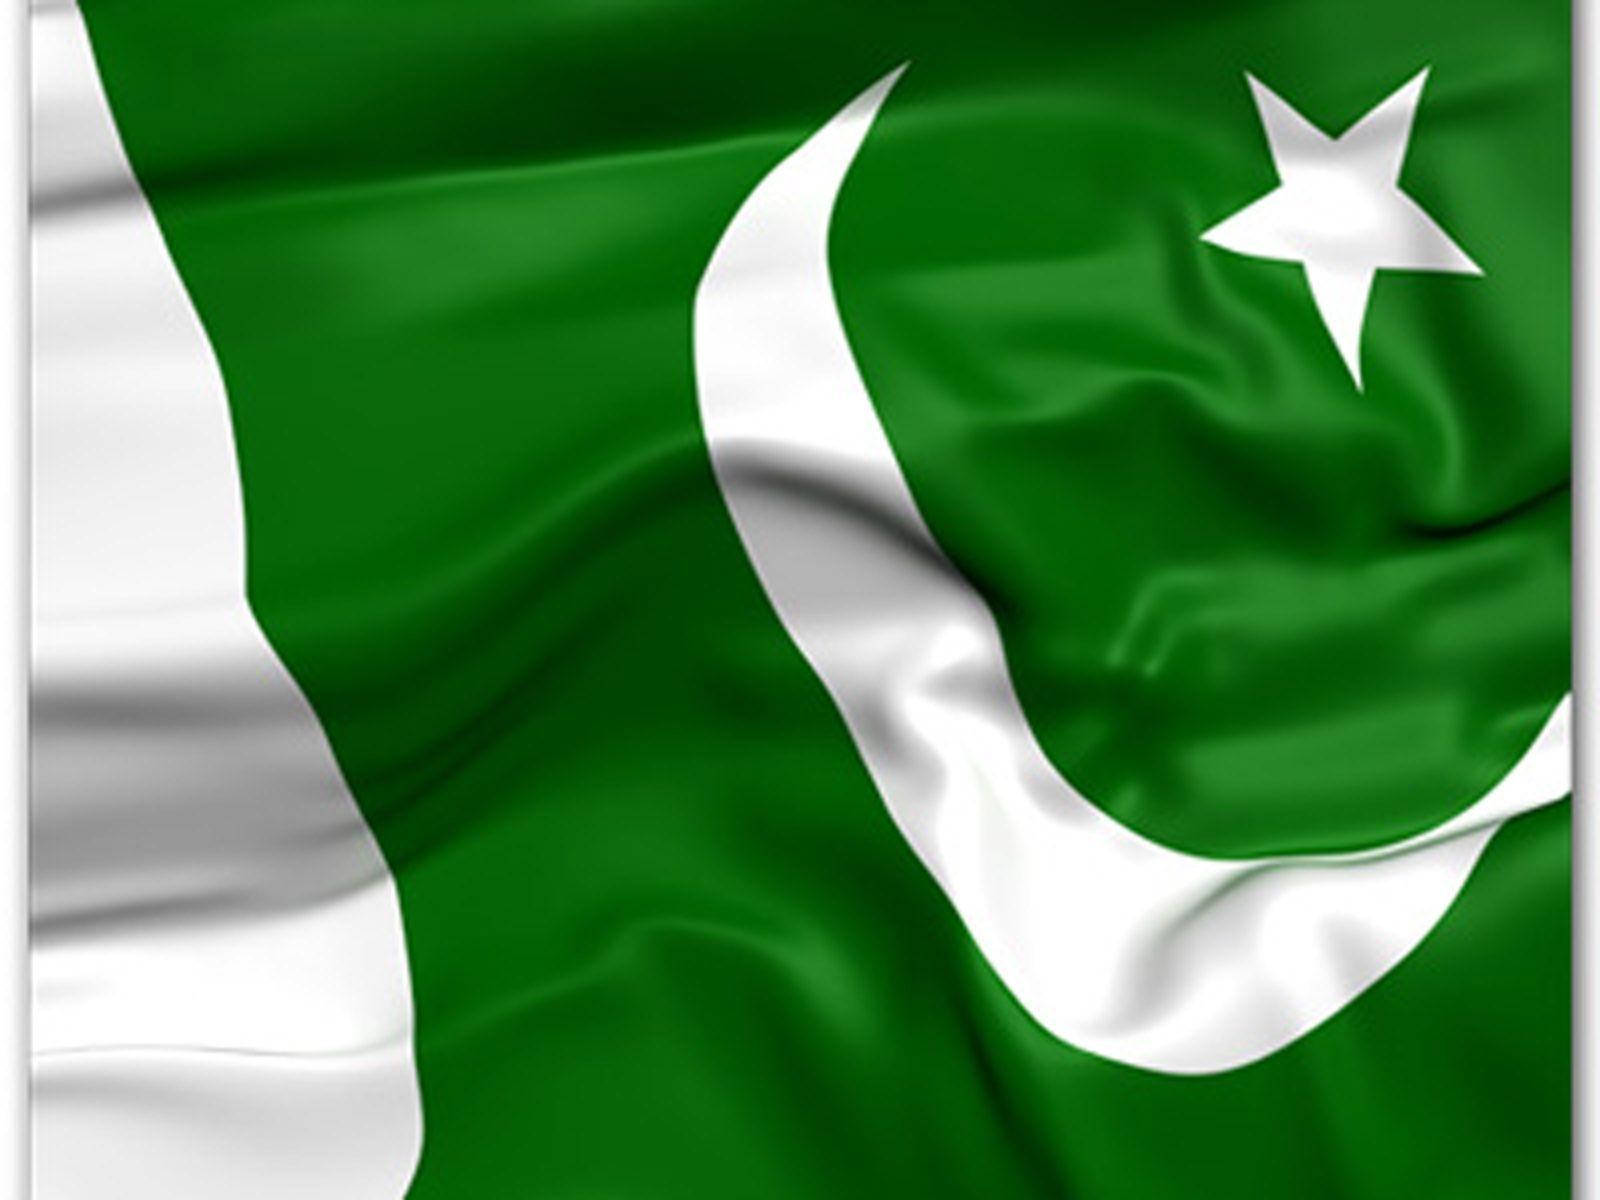 pakistan flag hd wallpapers - photo #8